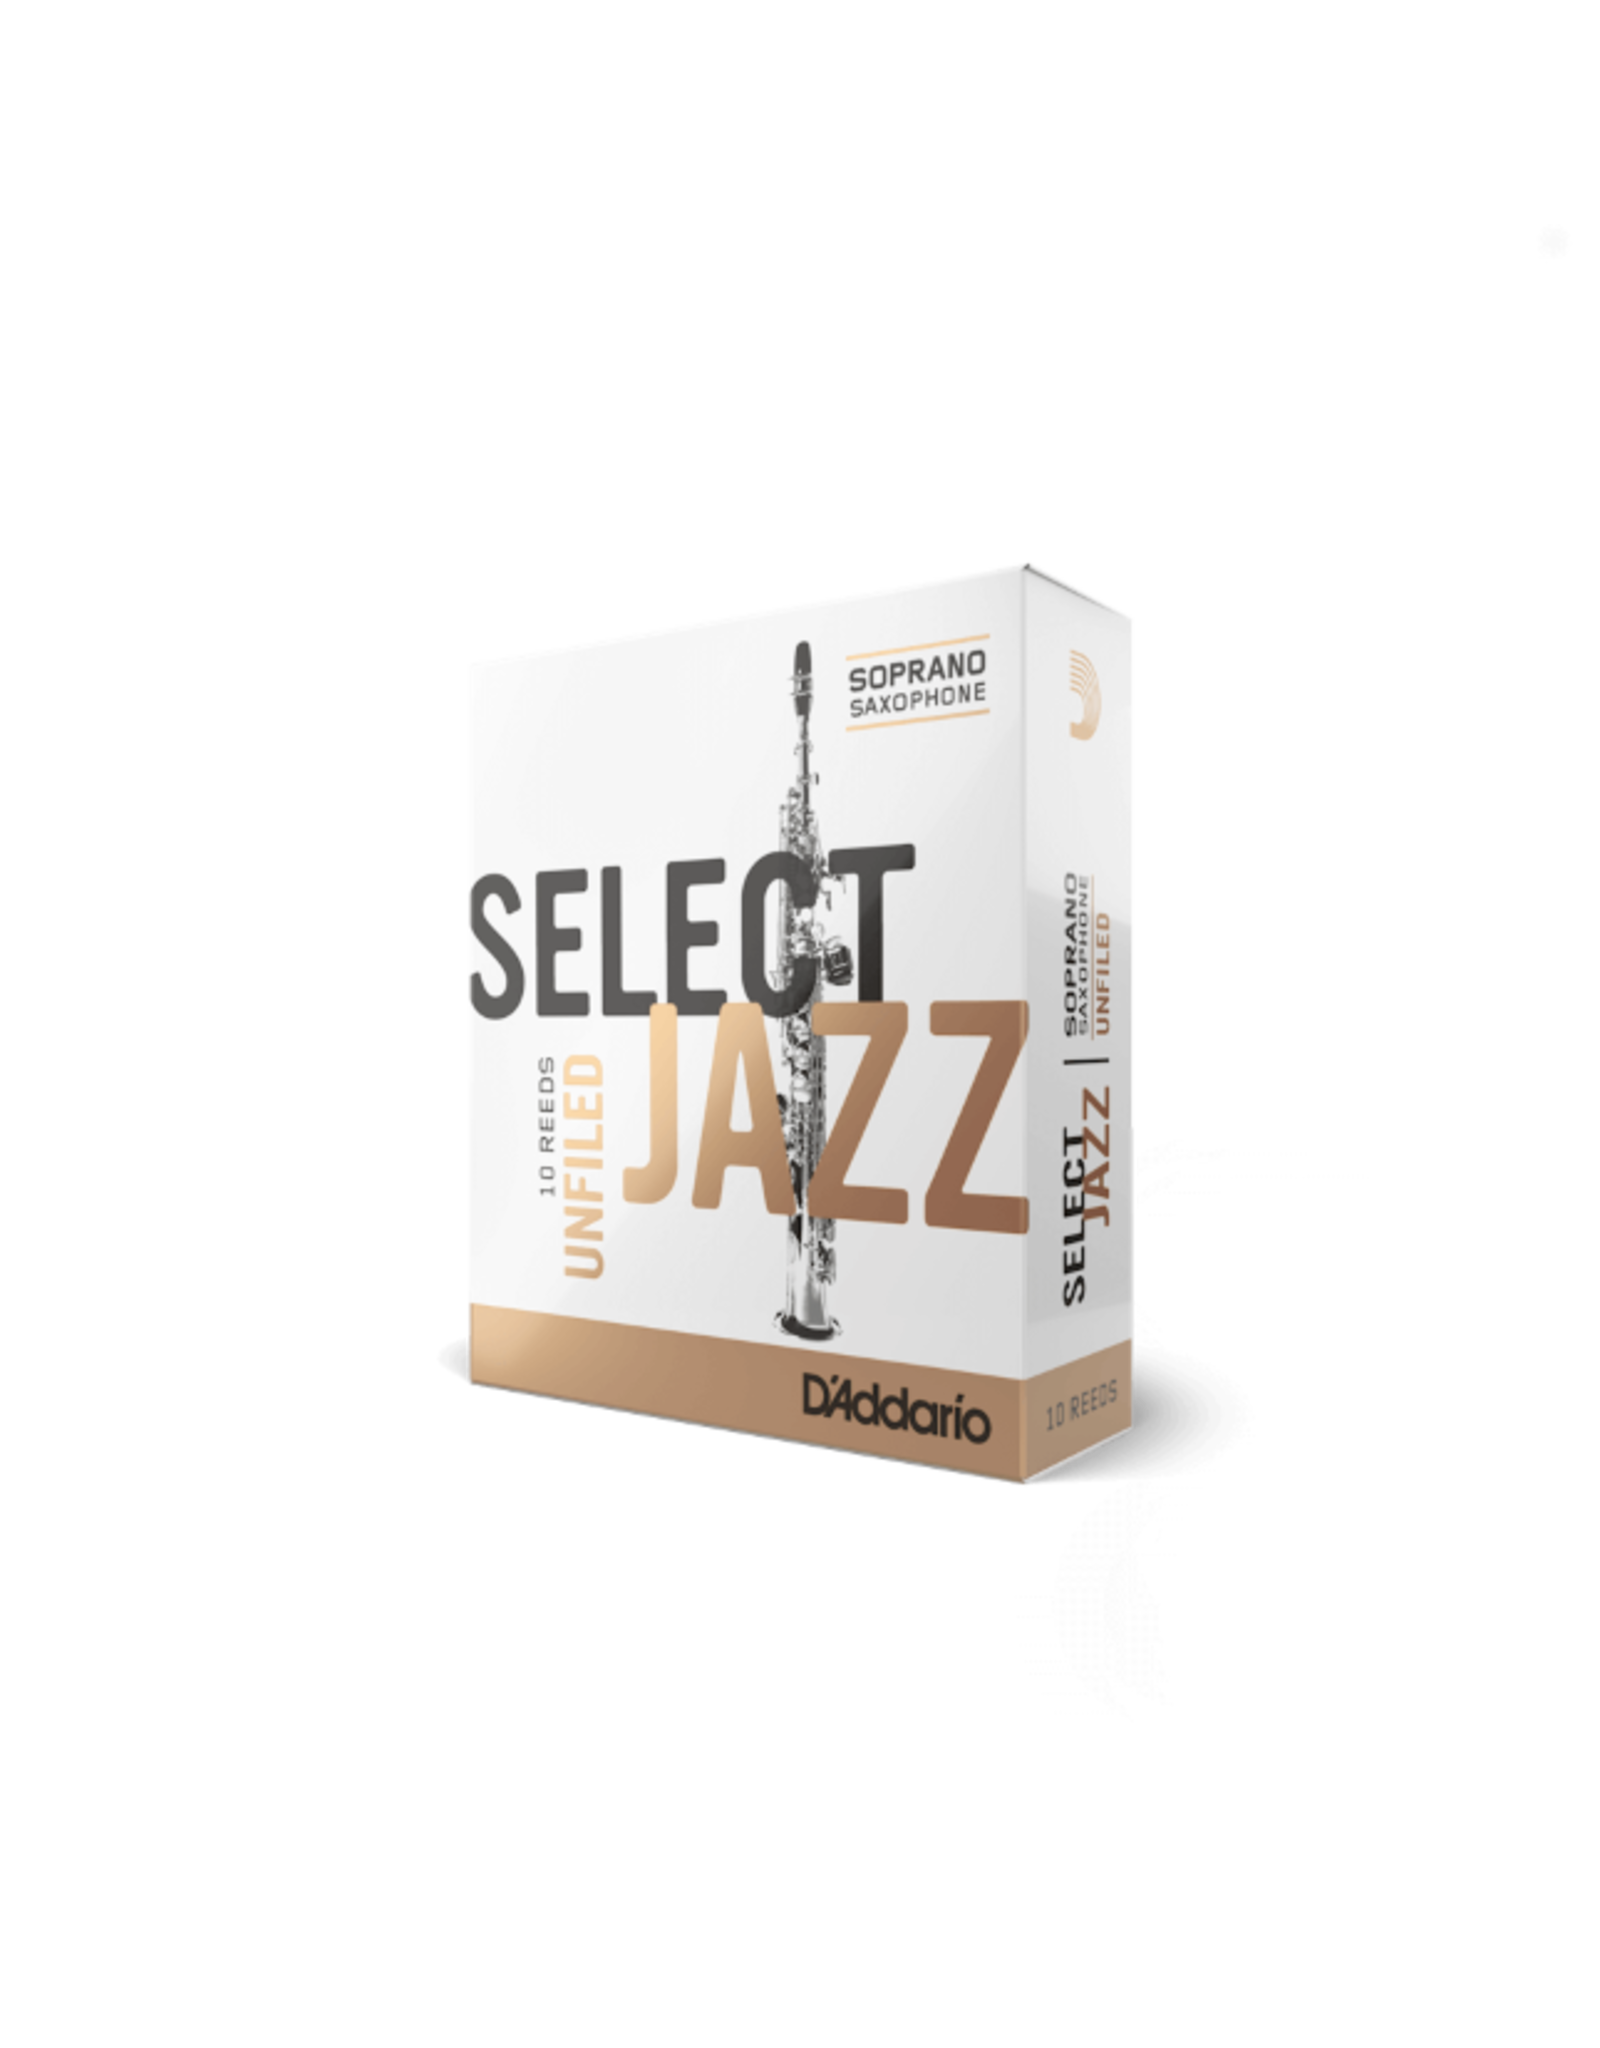 D'Addario D'addario Select Jazz Sopraan Sax  Unfiled rietjes